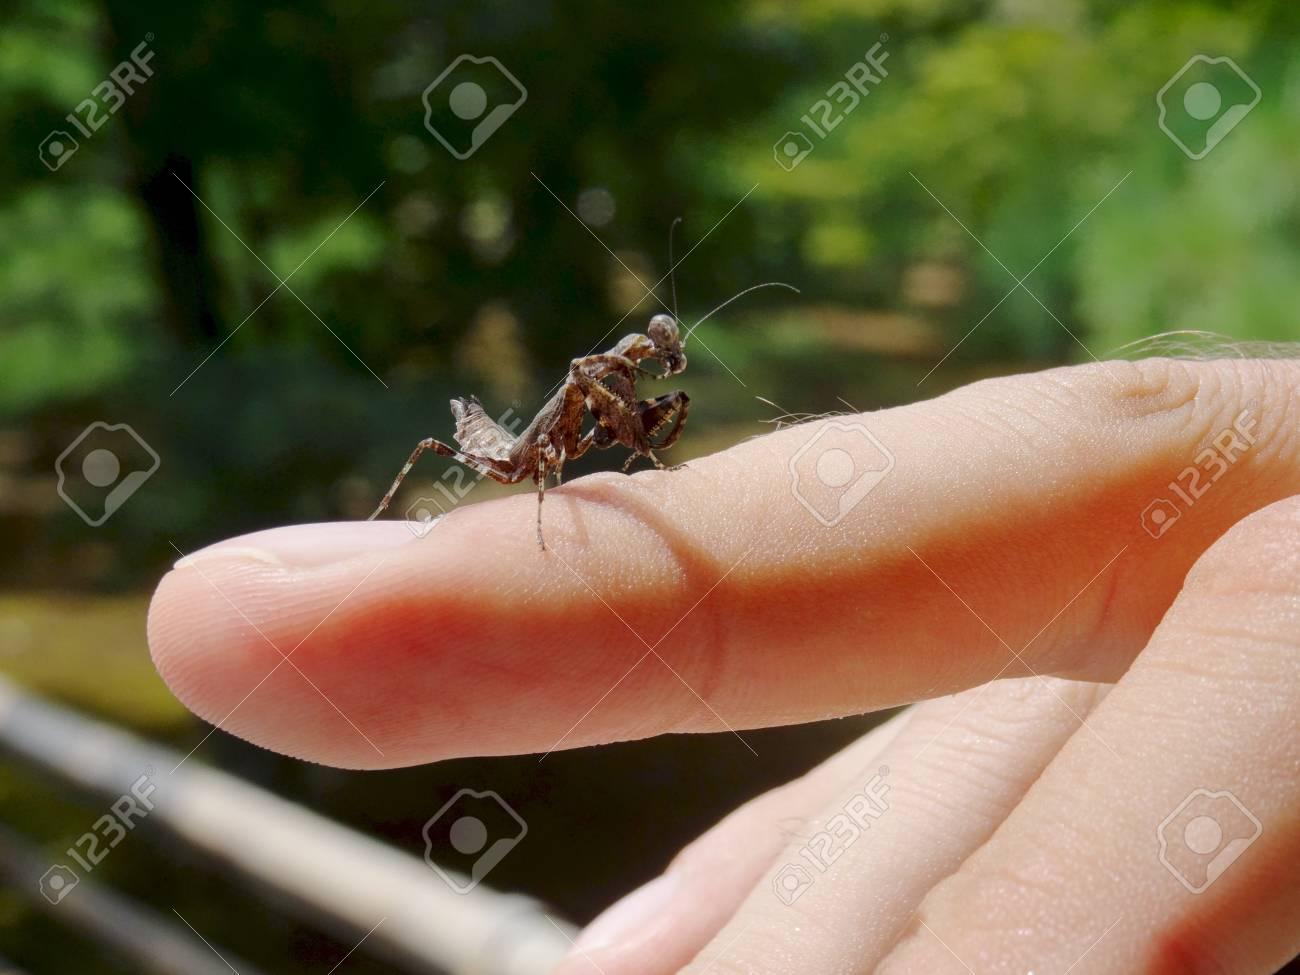 Close Up Of A Baby Black Praying Mantis Walking On A Finger